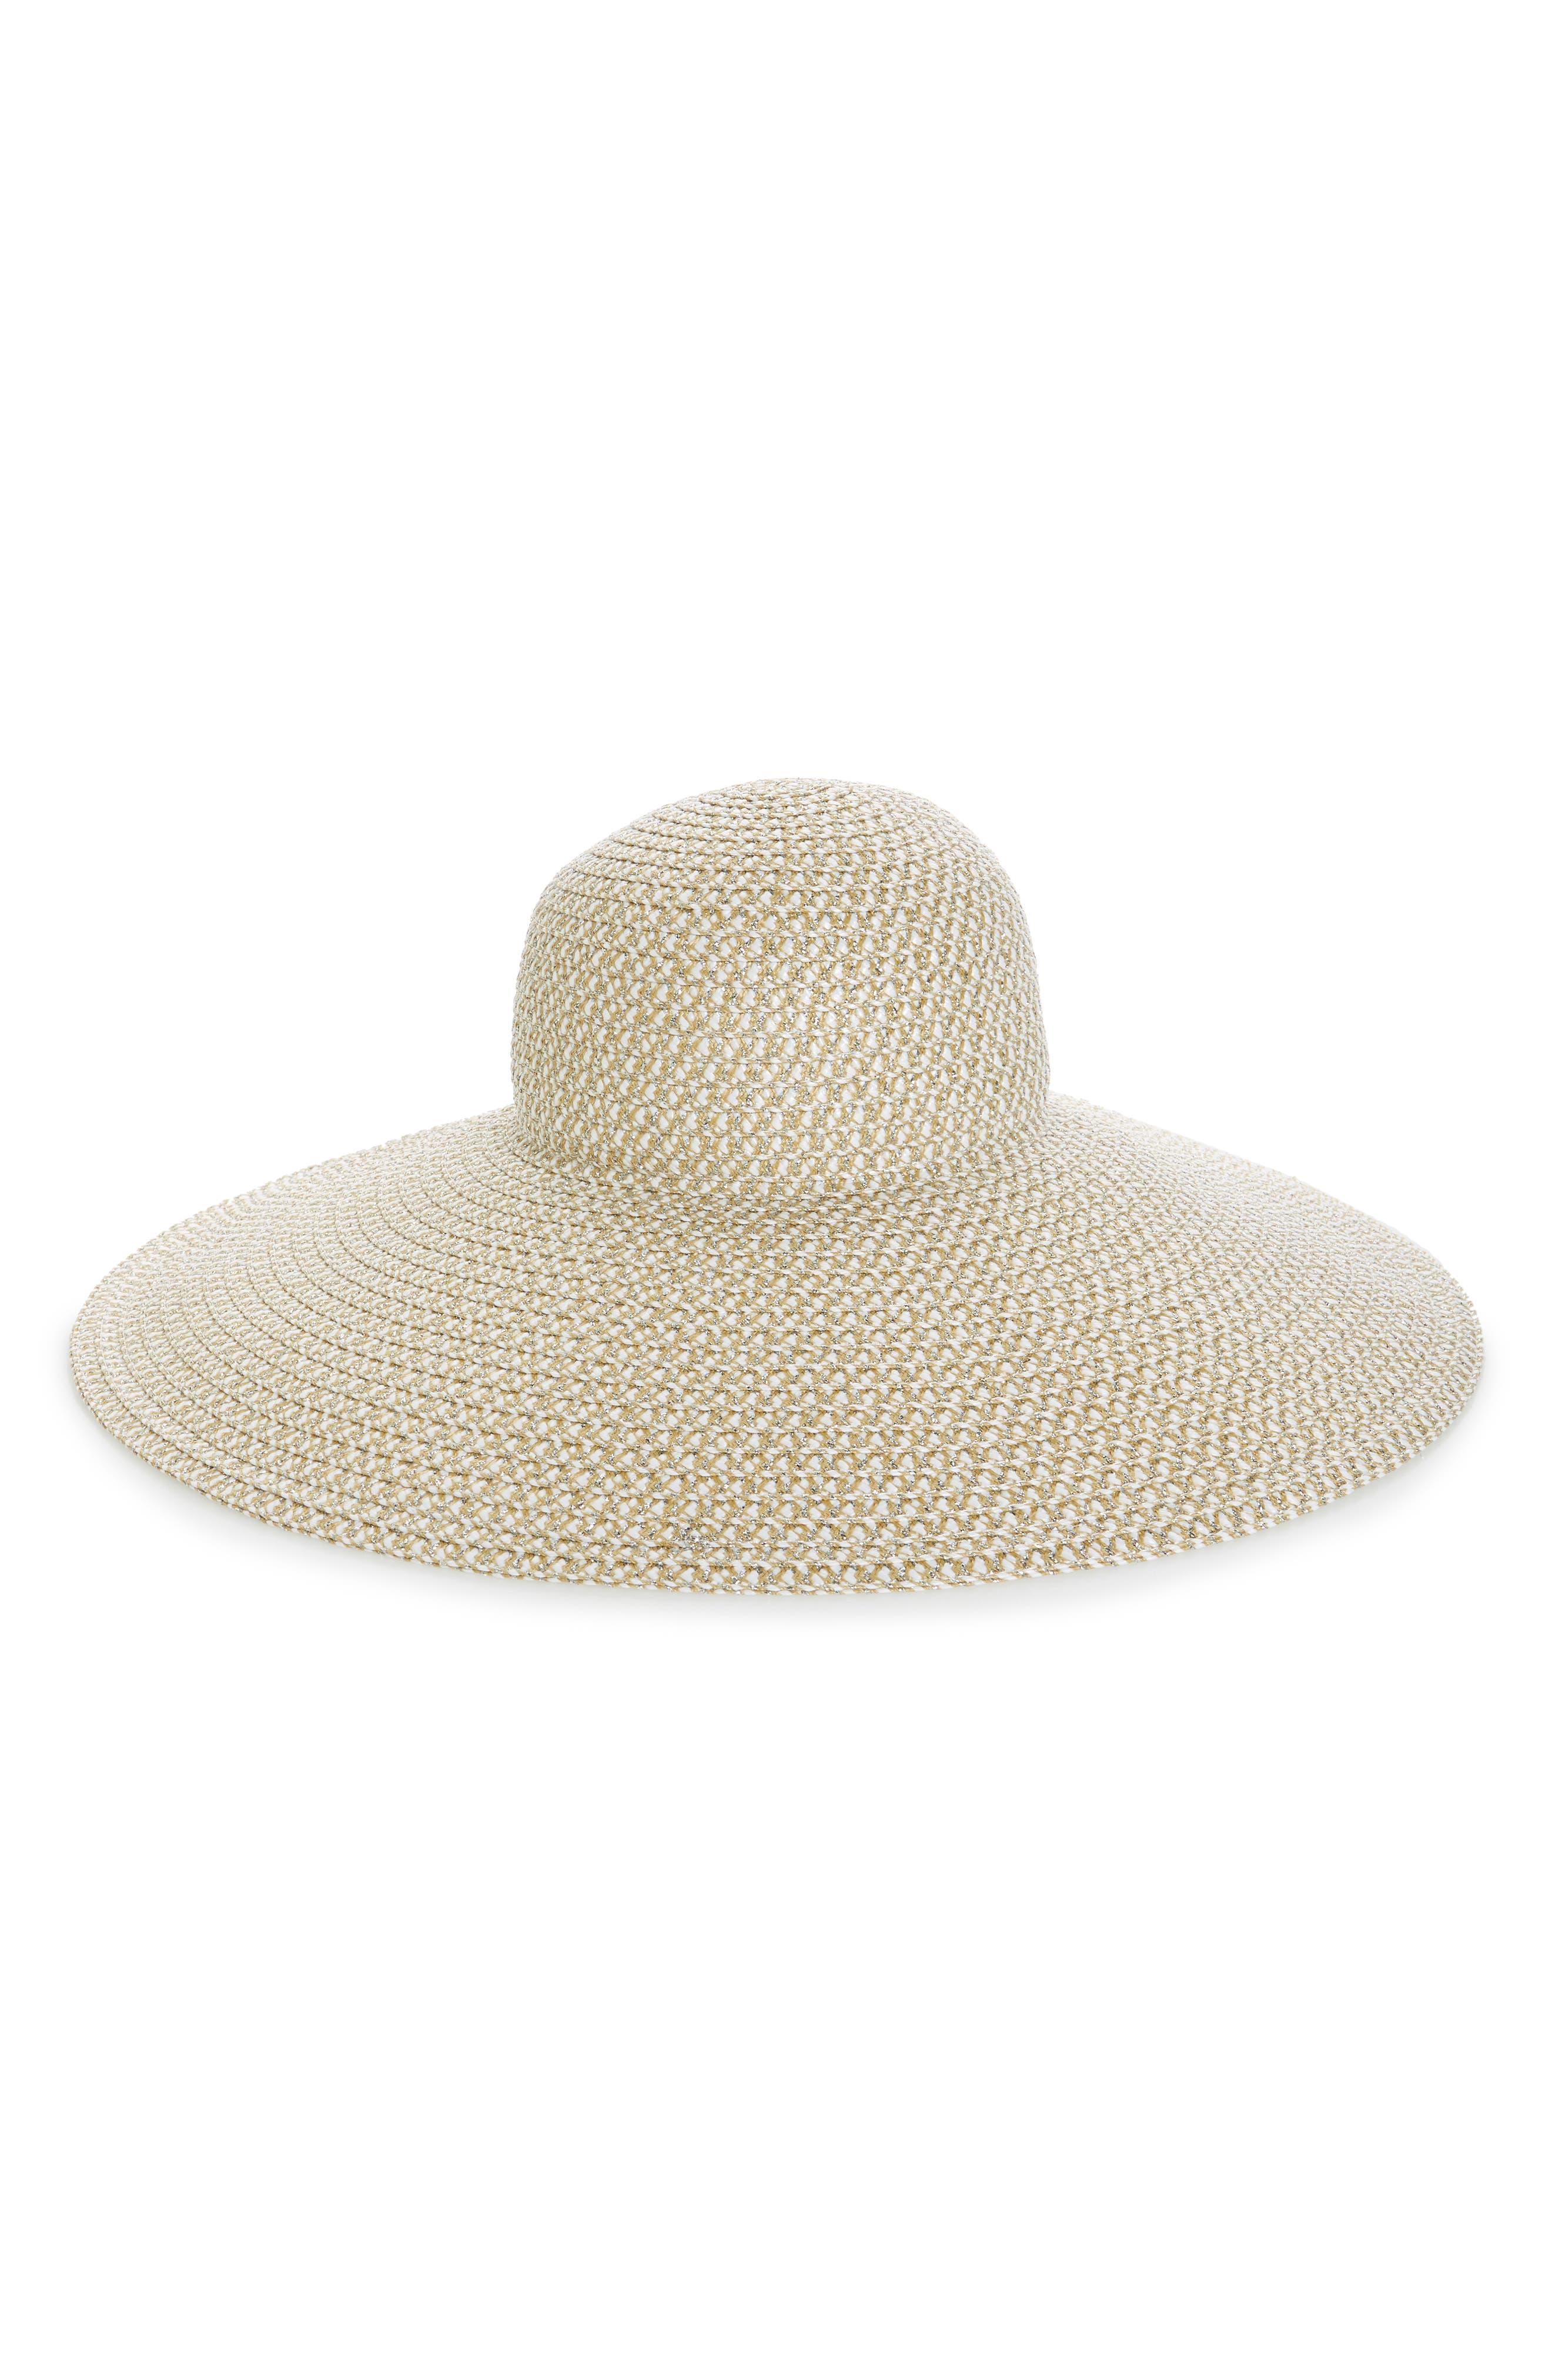 ERIC JAVITS, Floppy Straw Hat, Main thumbnail 1, color, ICE